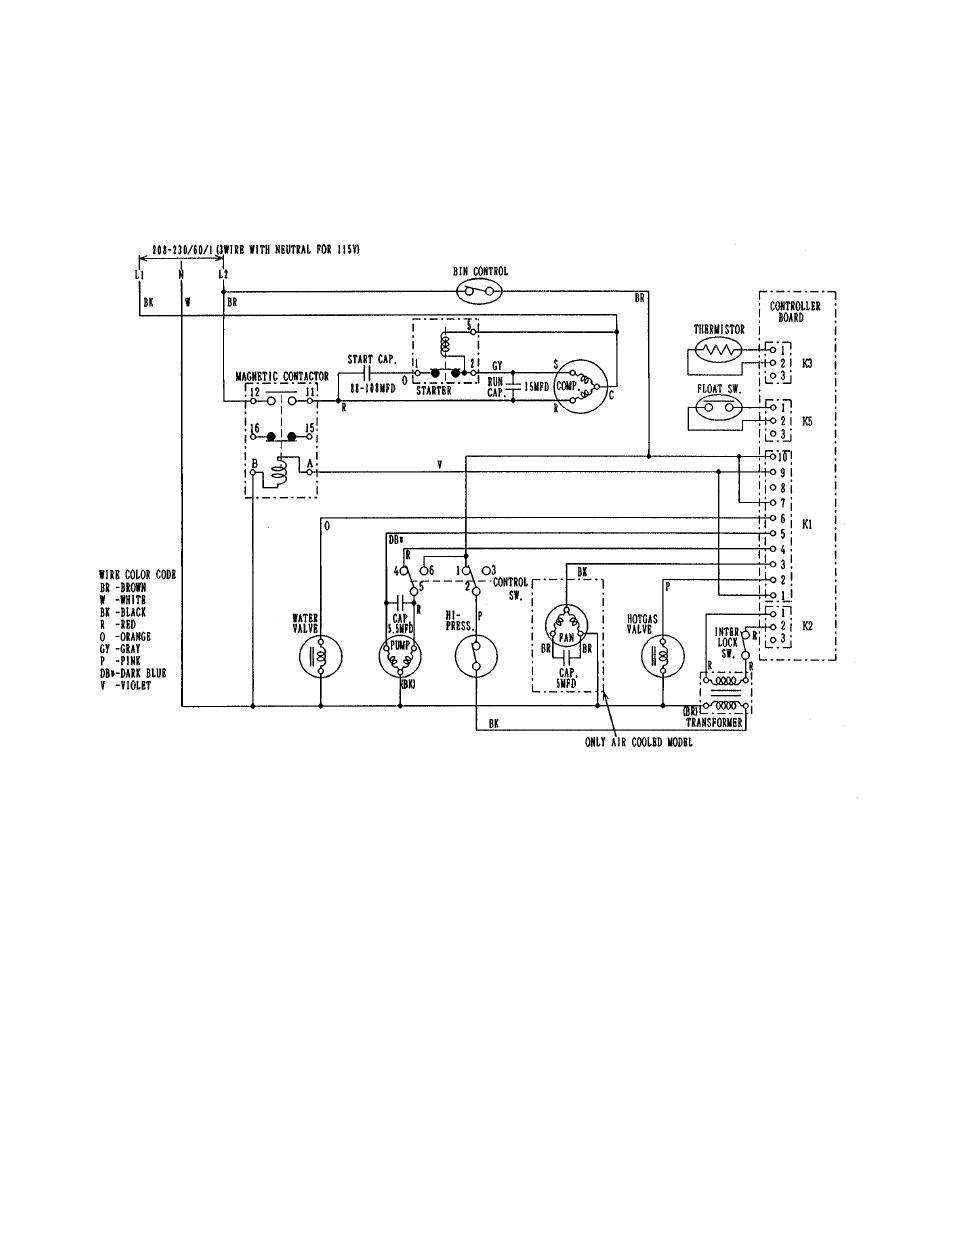 hoshizaki km 630mwf user manual page 28 61 also for km 630maf rh manualsdir com